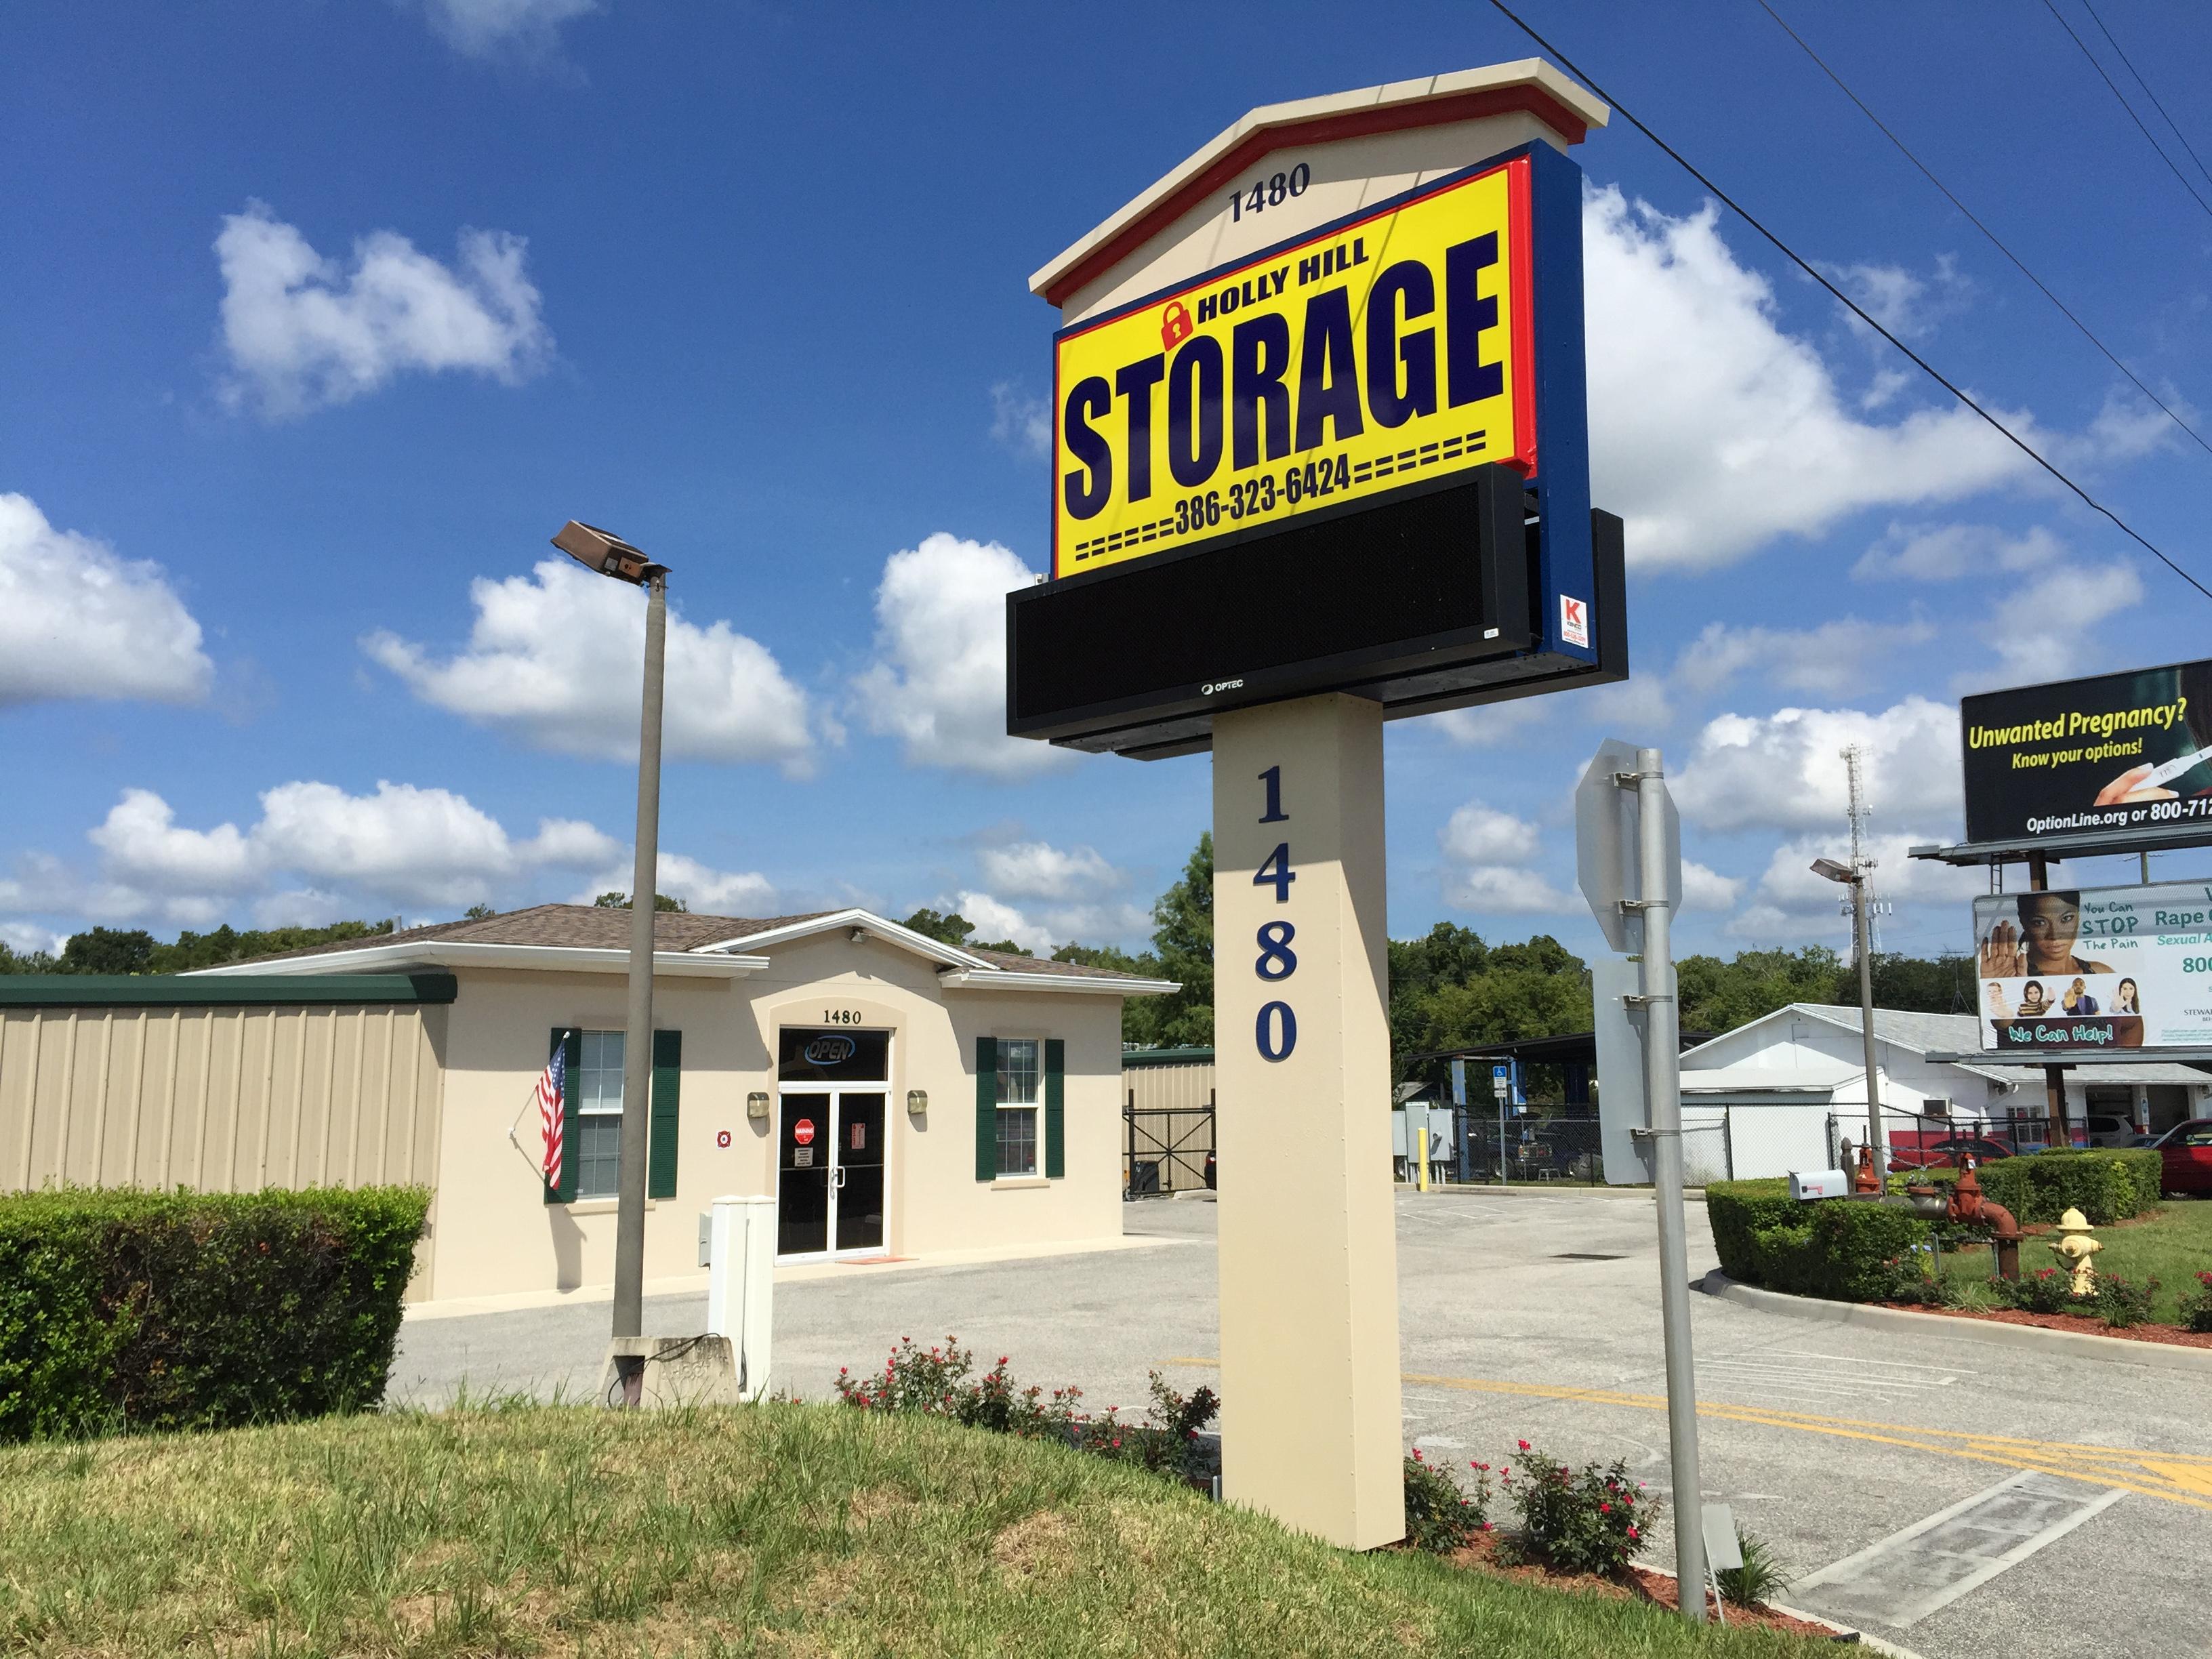 & Holly Hill Mini Storage 1480 N Nova Rd Daytona Beach FL 32117 - YP.com